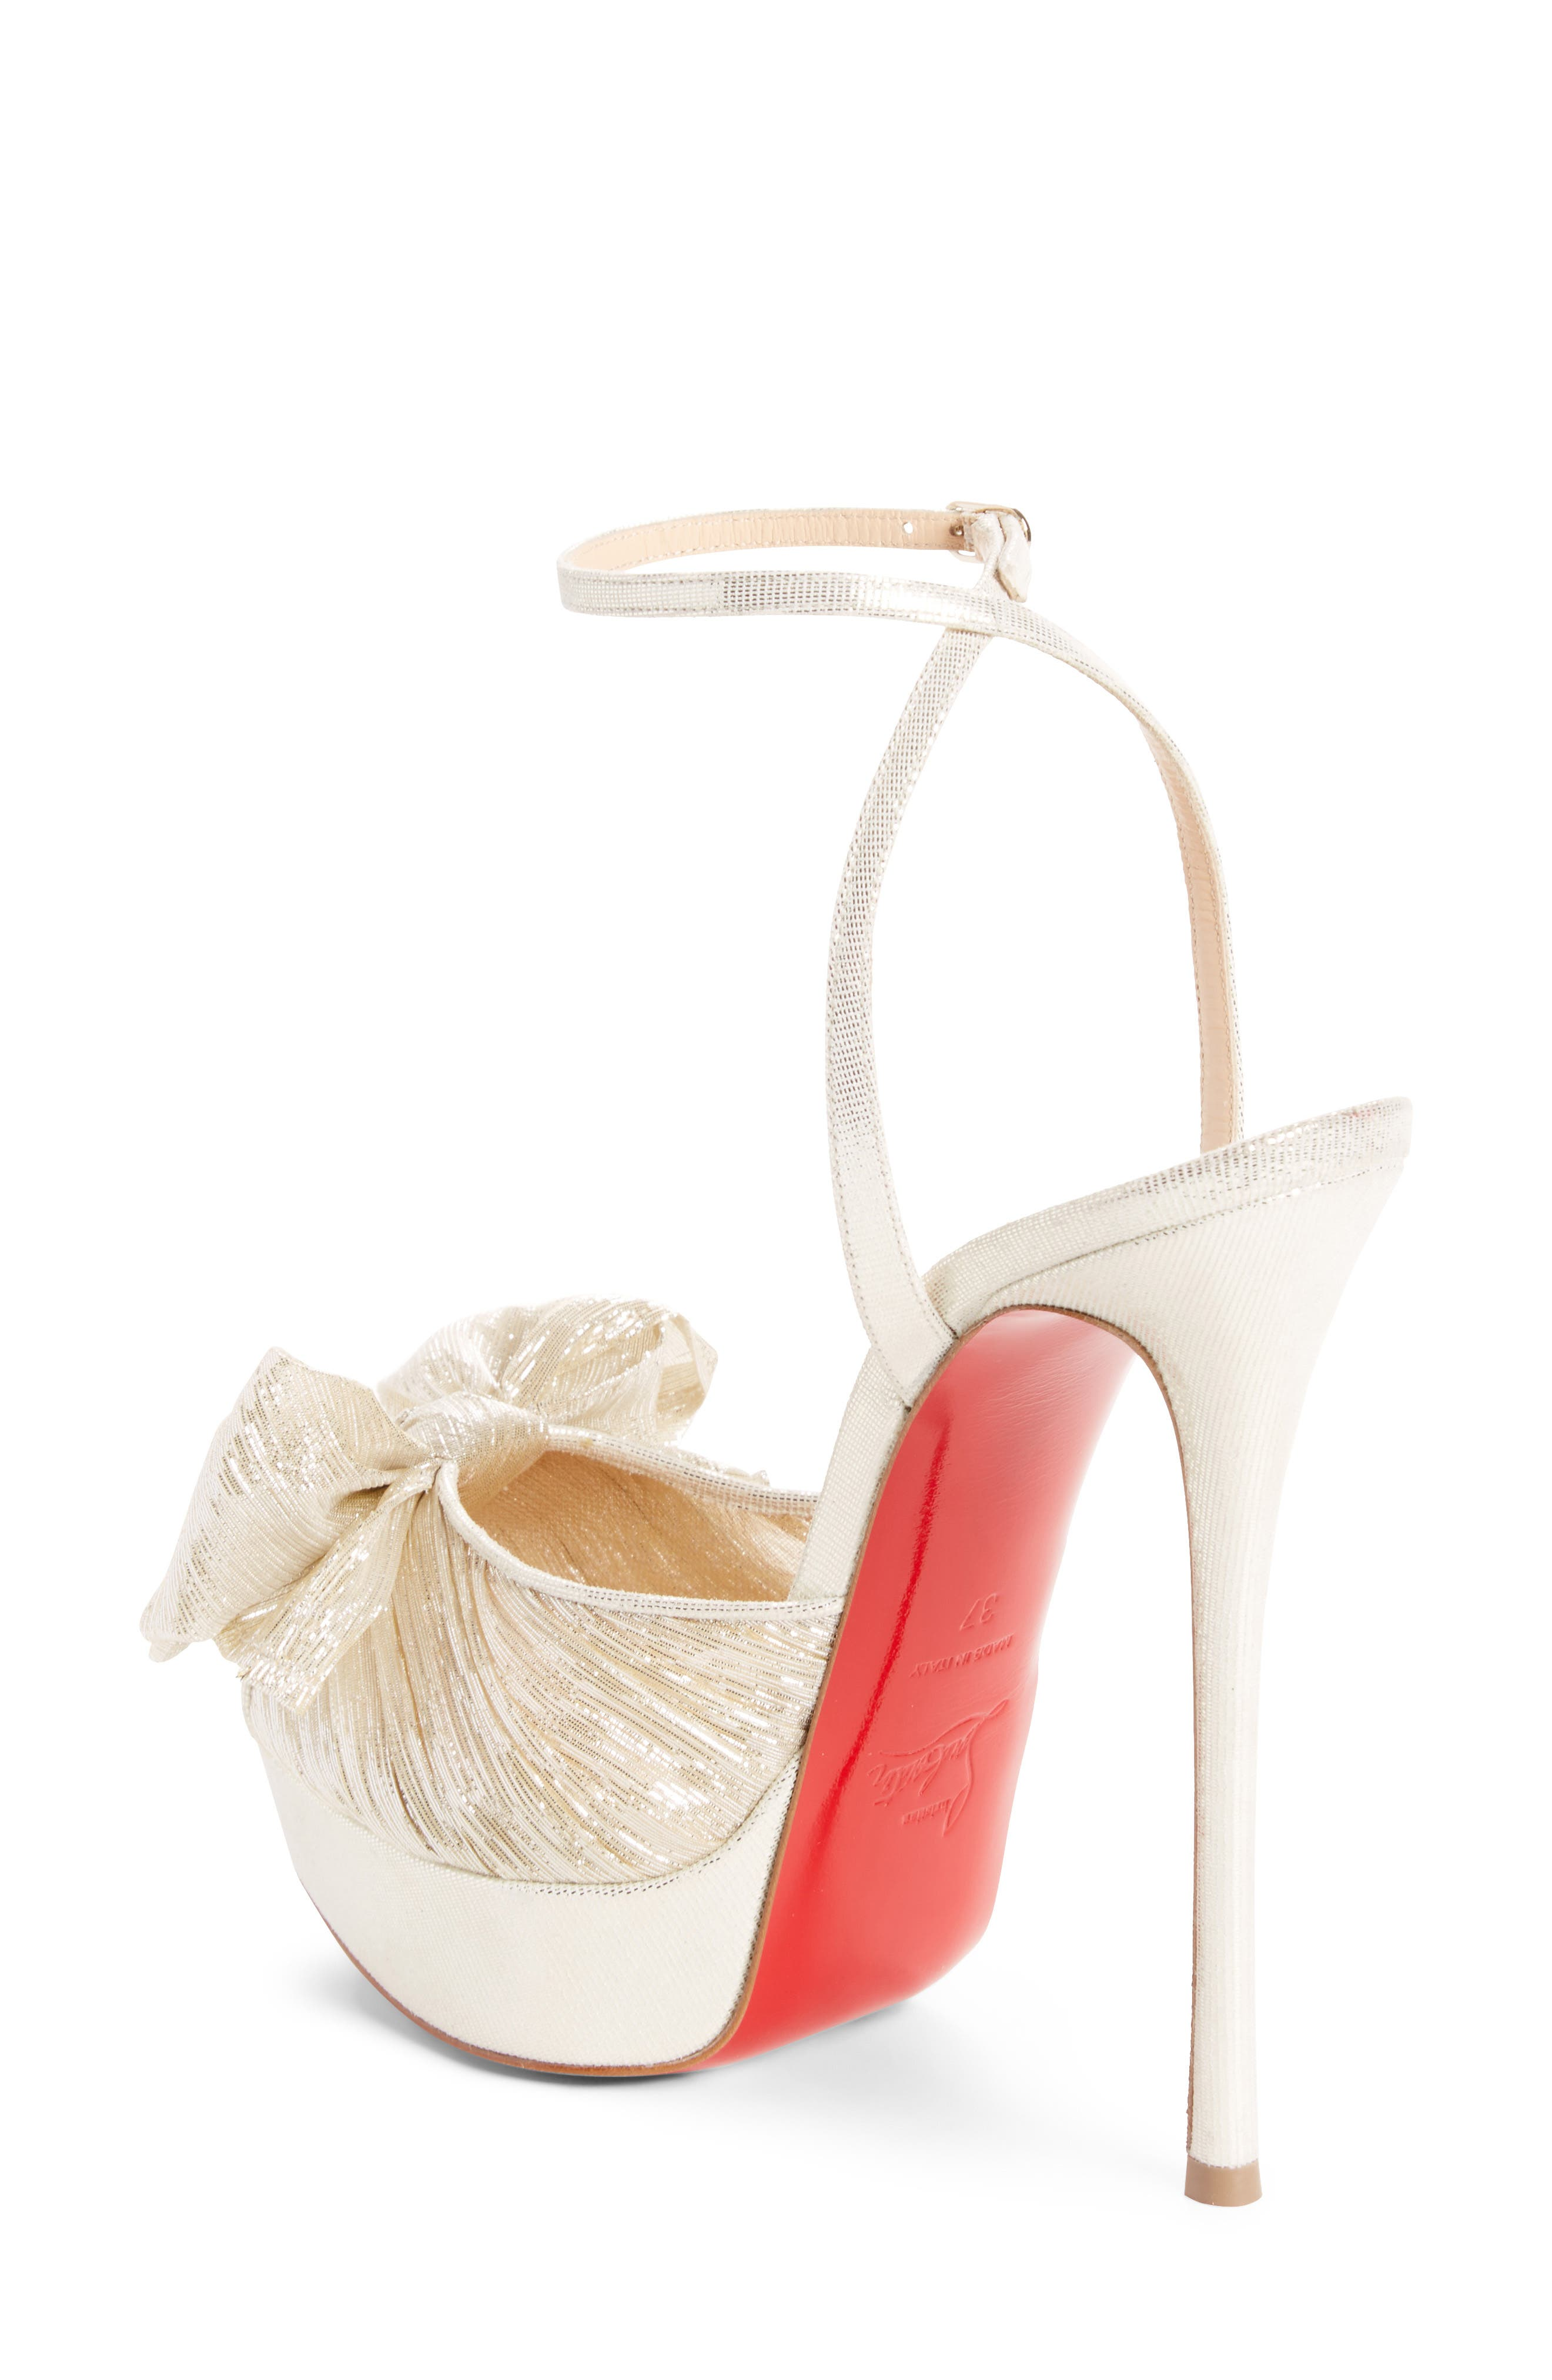 Artydiva Platform Ankle Strap Sandal,                             Alternate thumbnail 2, color,                             Platine Silver